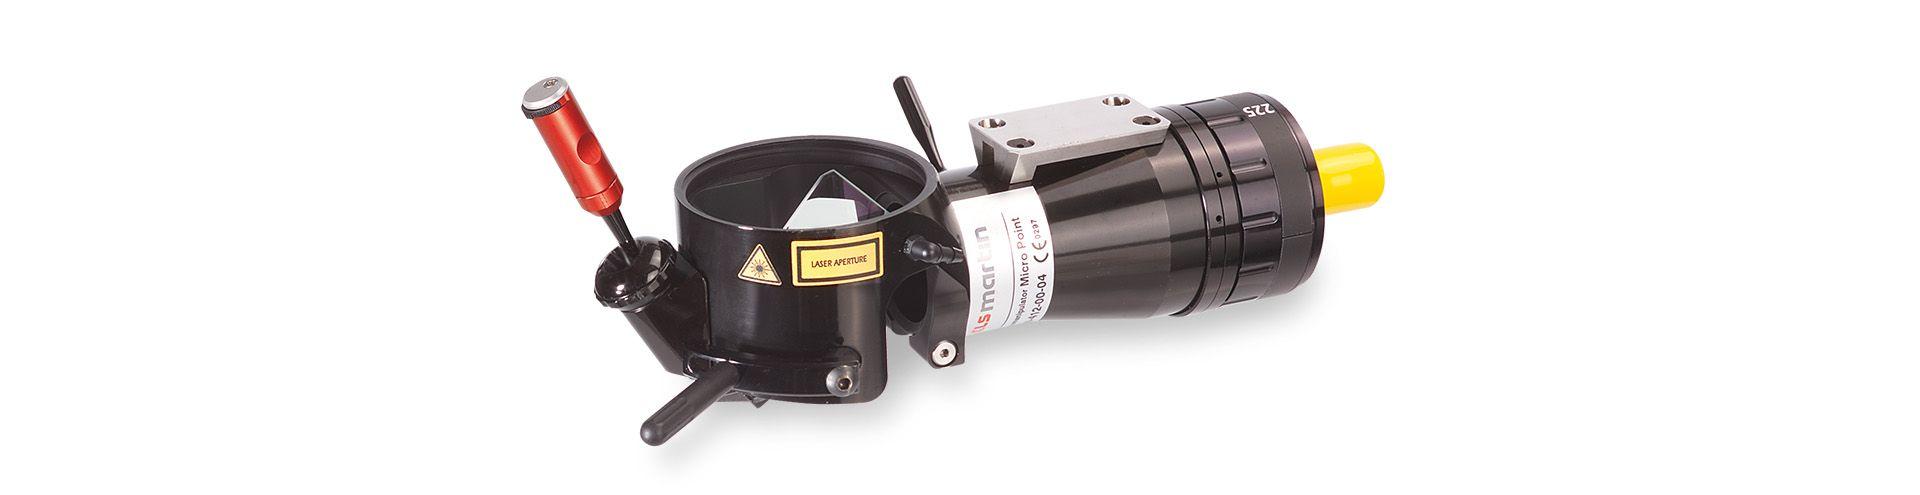 Láser de CO2 MCO plus - micromanipulador MicroPoint 2S